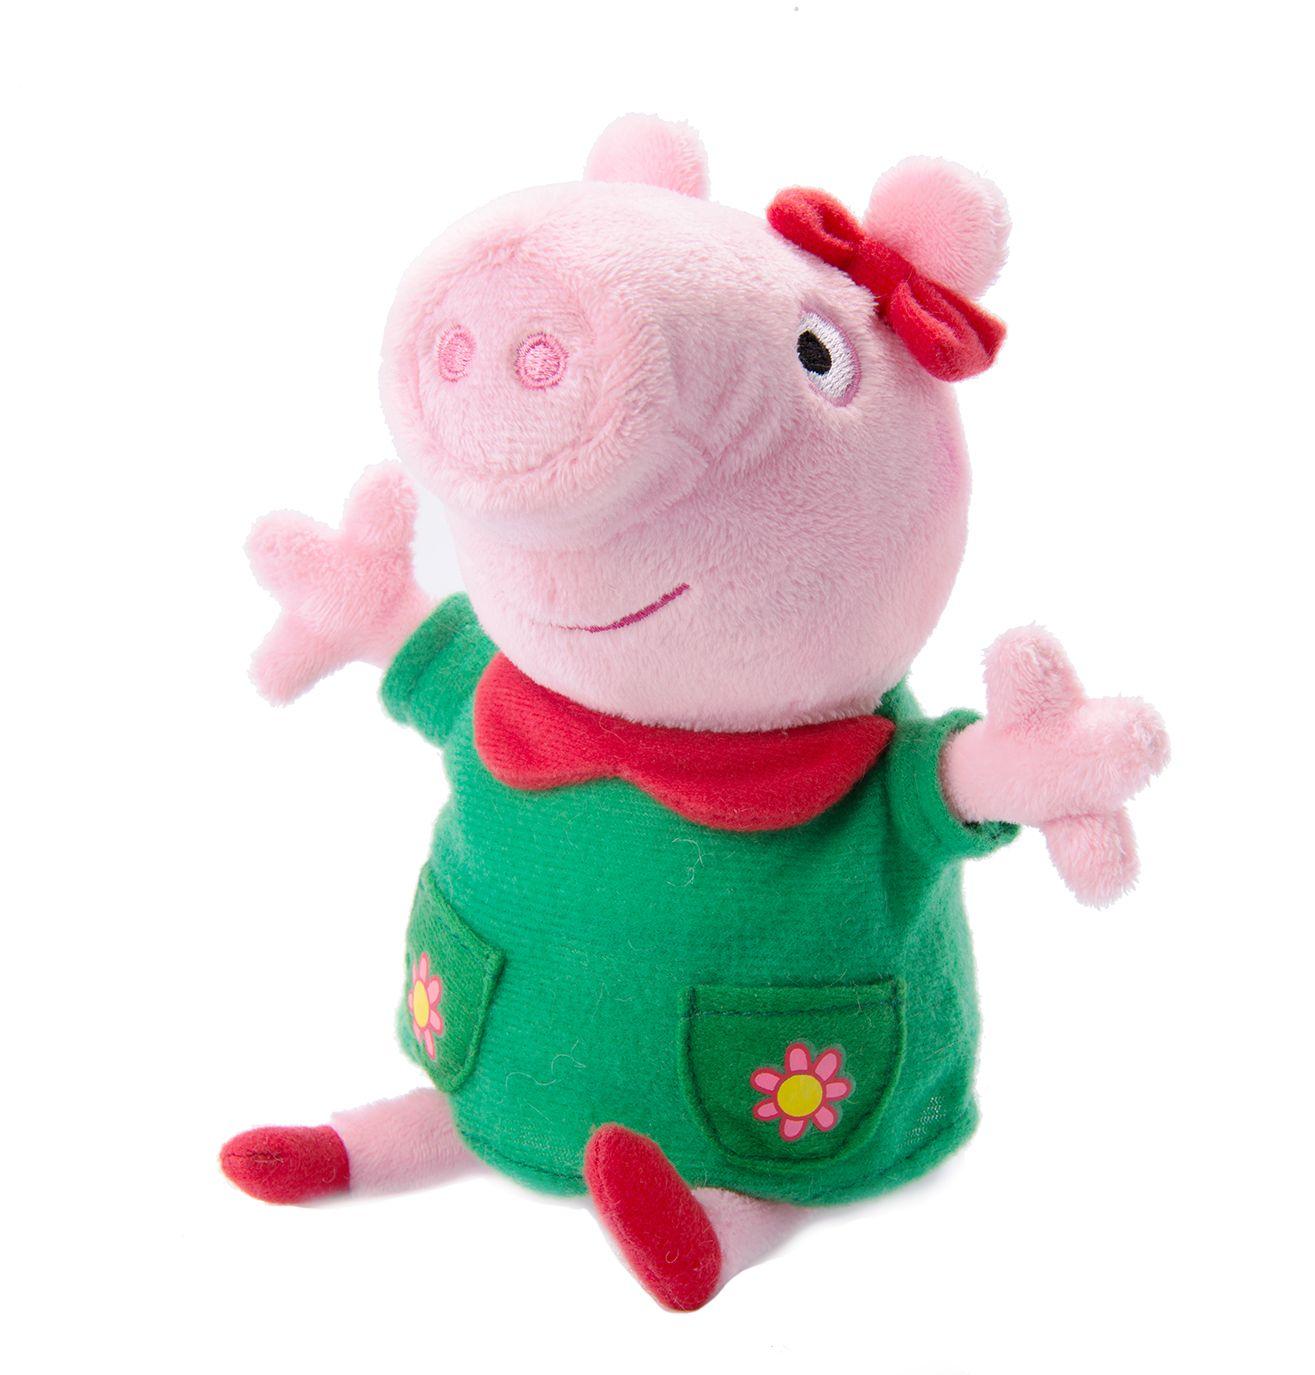 Мягкая игрушка Peppa Pig: Пеппа модница со звуком (20 см)